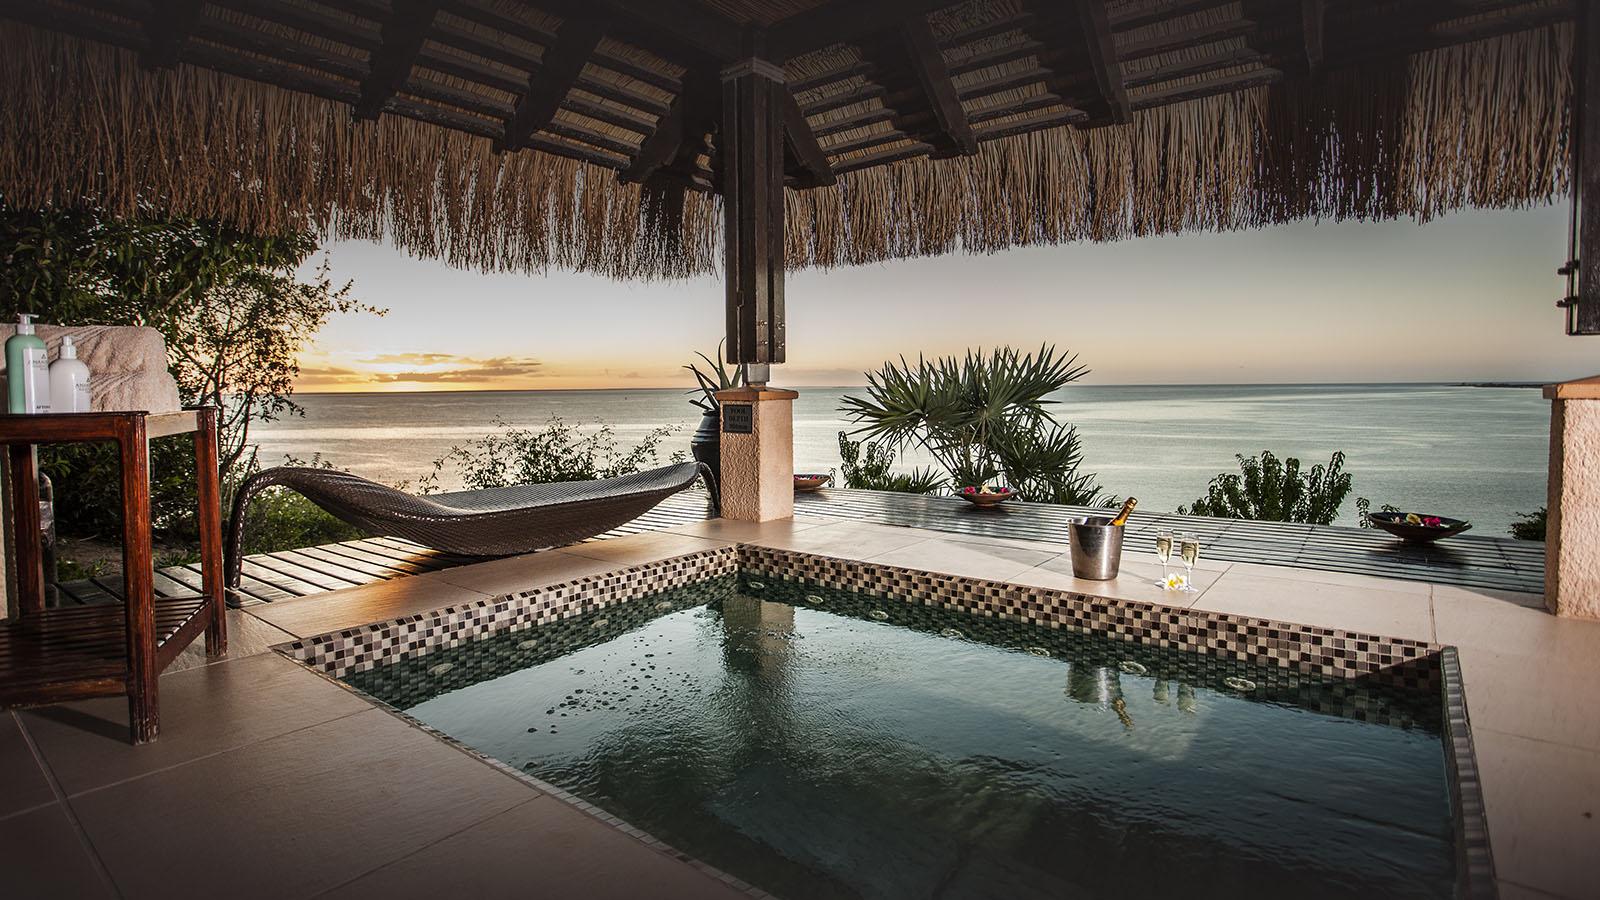 anantara bazaruto mozambique-lodges-zambia-in-style-luxury-bazaruto-island-pool-seaview